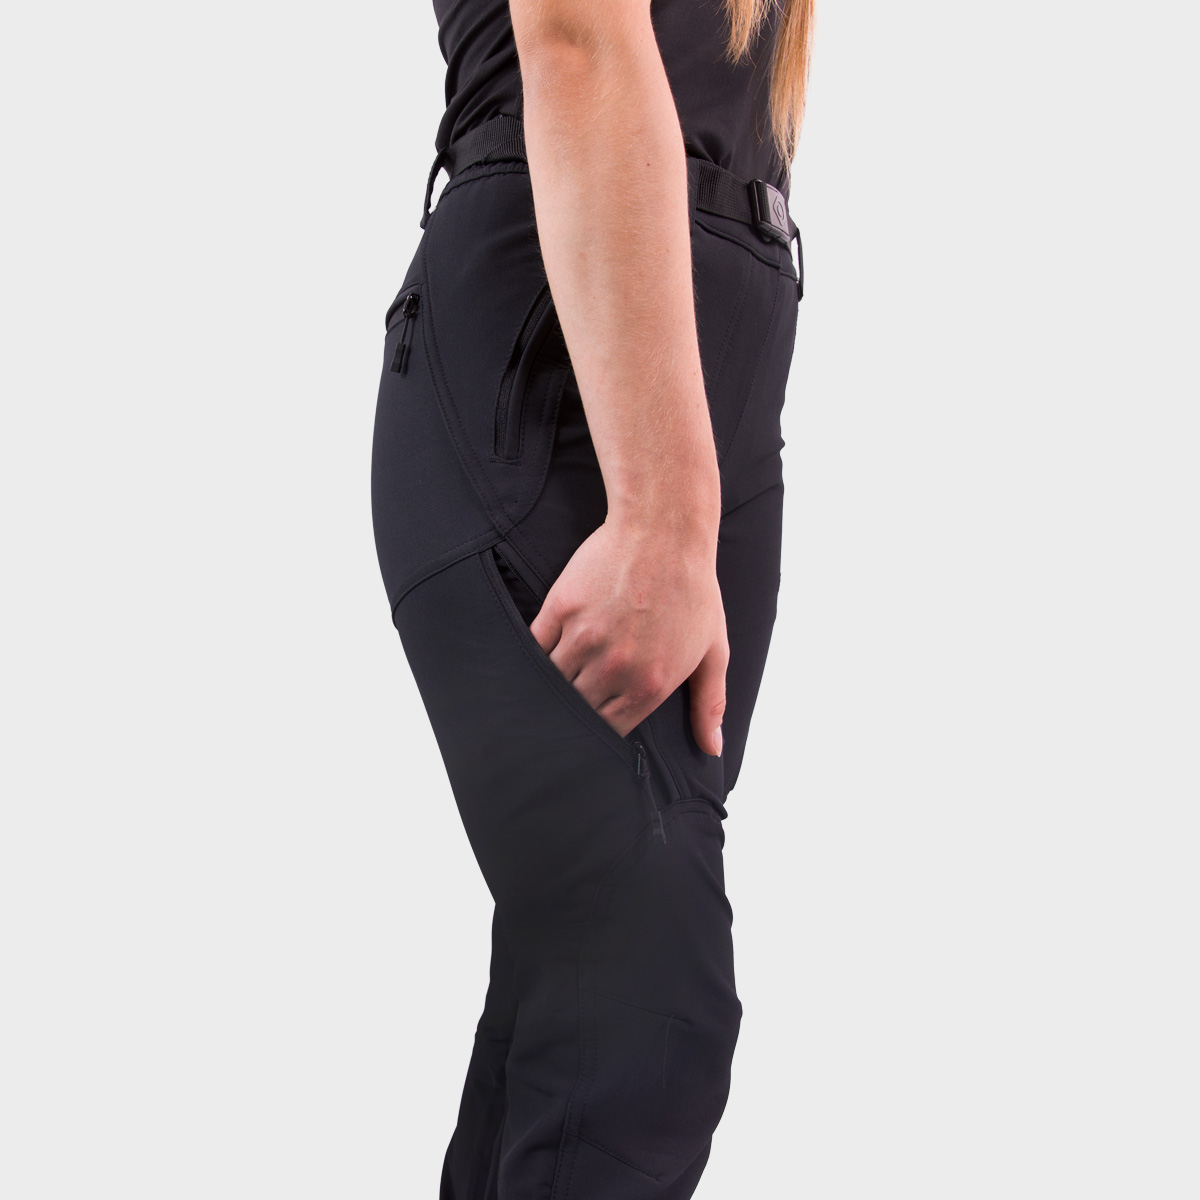 WOMAN'S VALLUNA STRETCH PANT BLACK